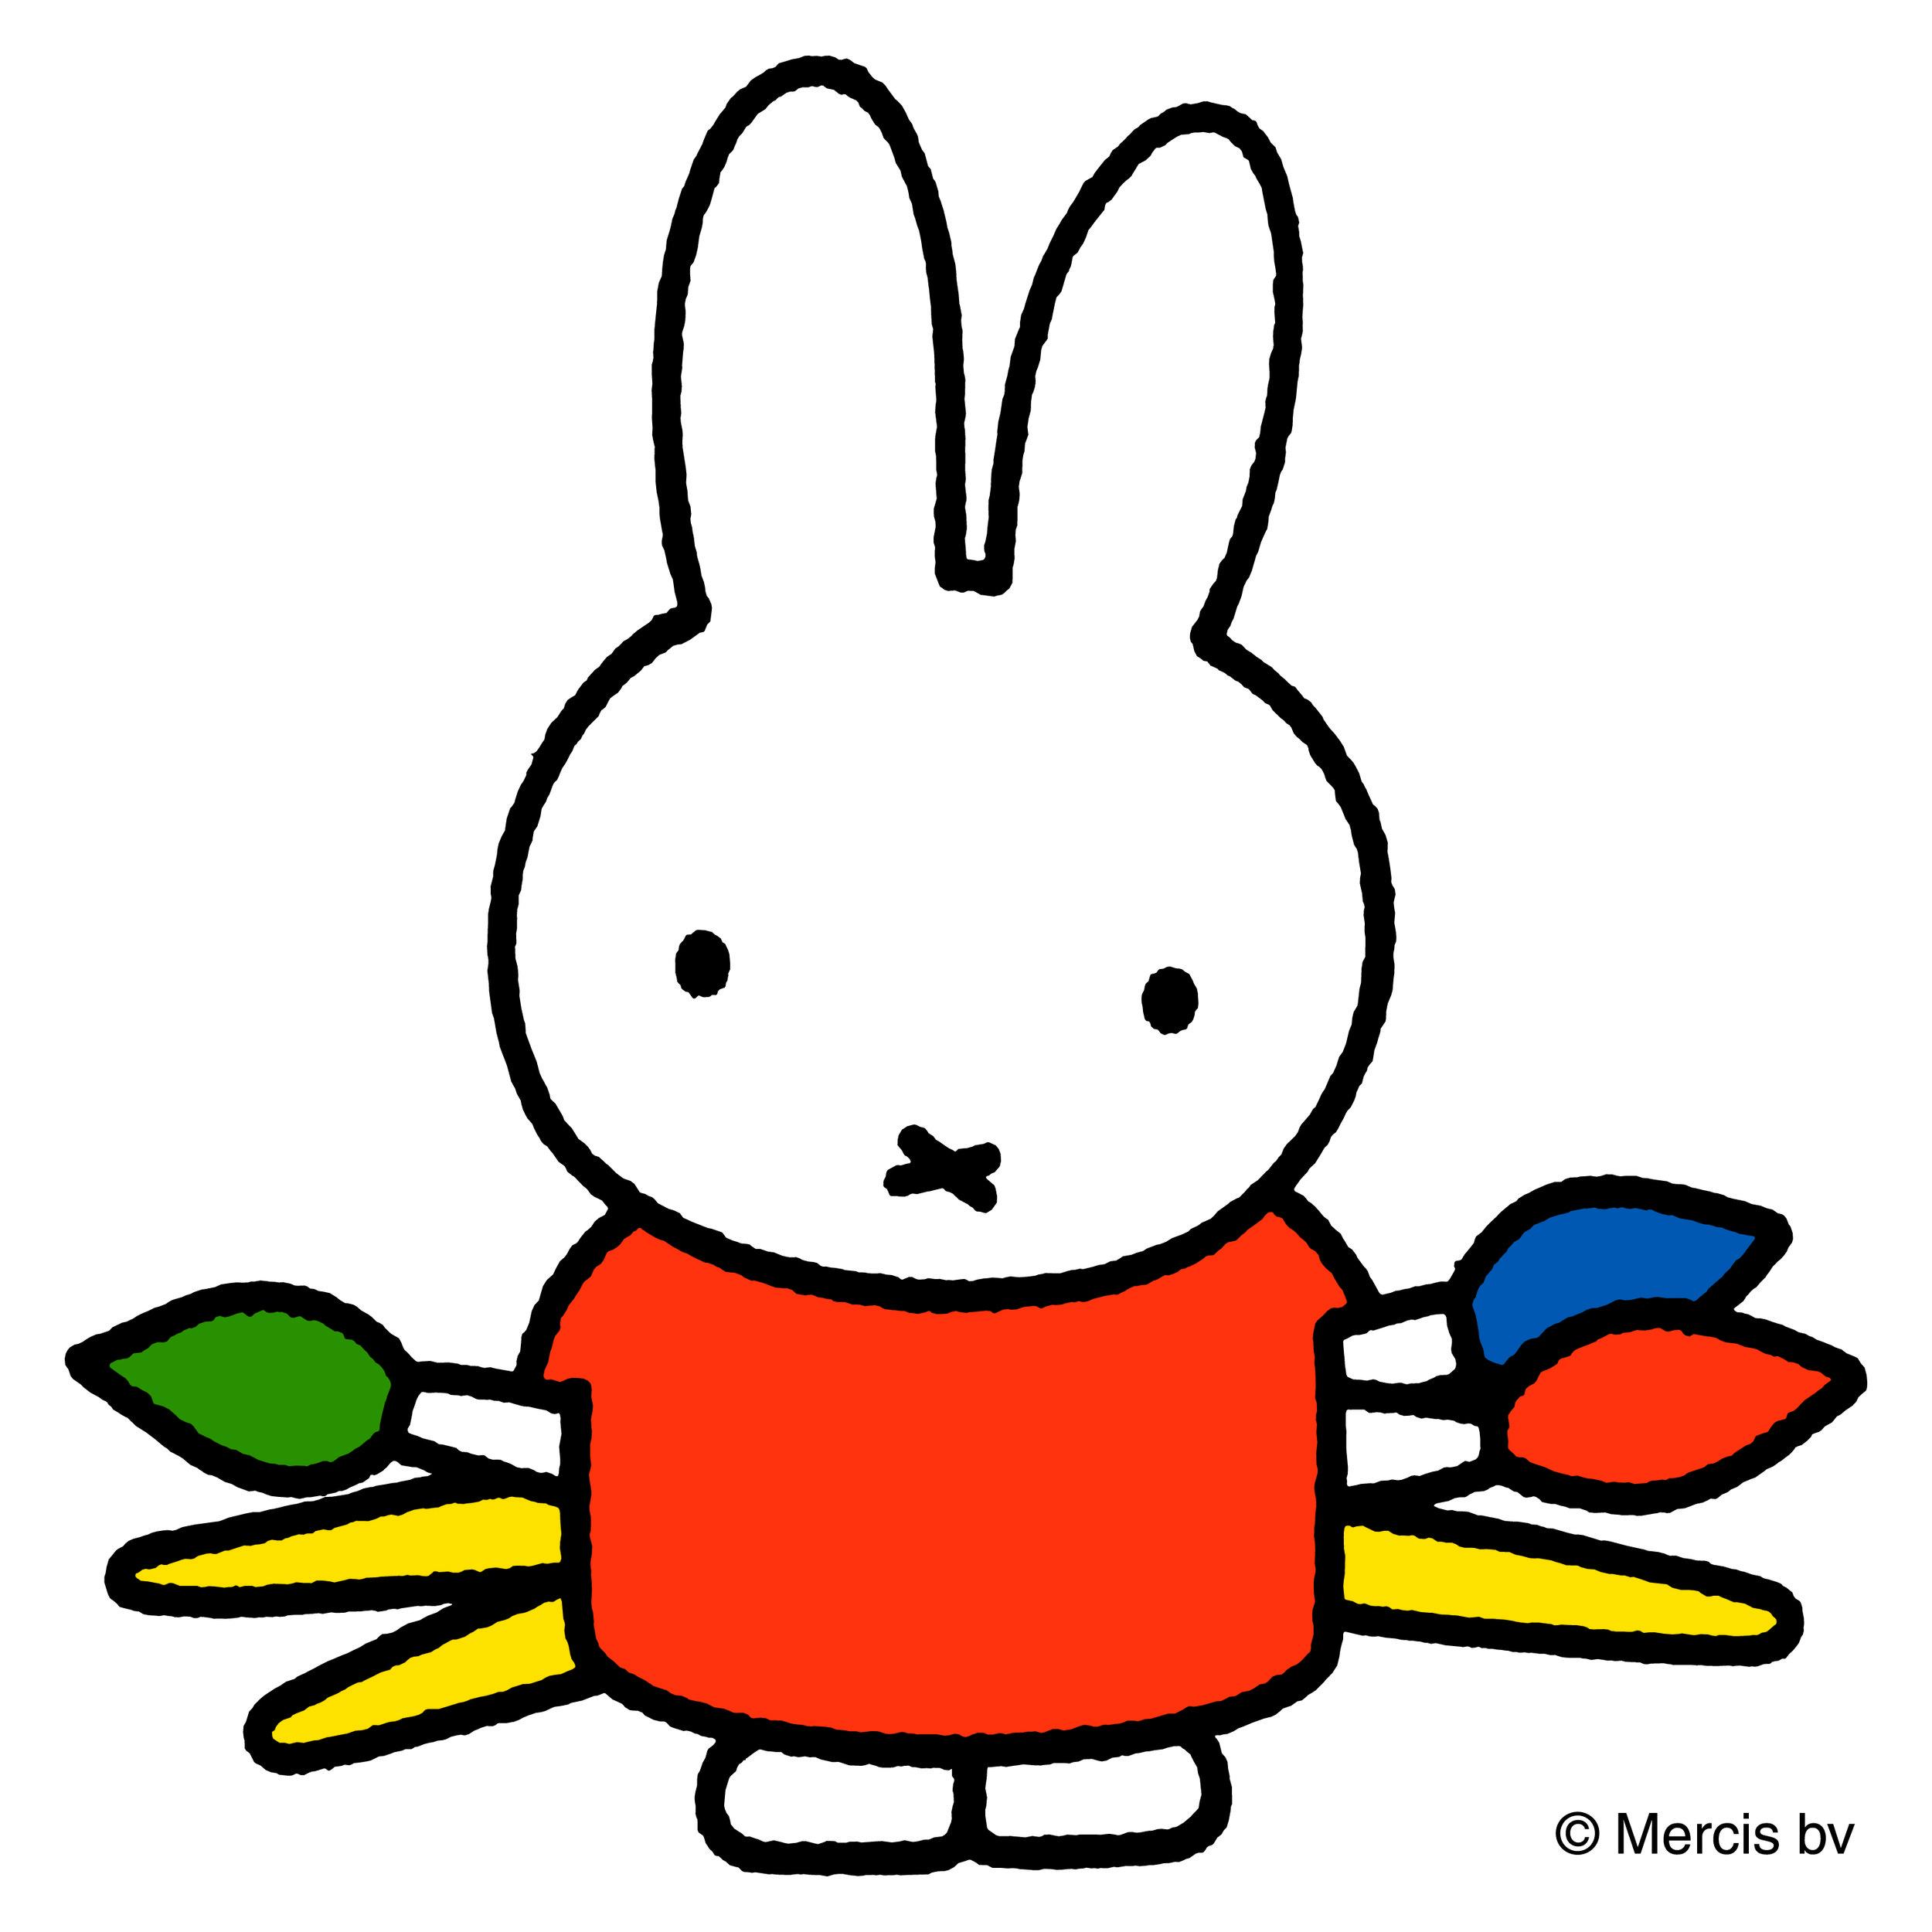 150768-Dick Bruna Illustration from -Miffy at the Gallery- 1997-0382b0-original-1417711673.jpg